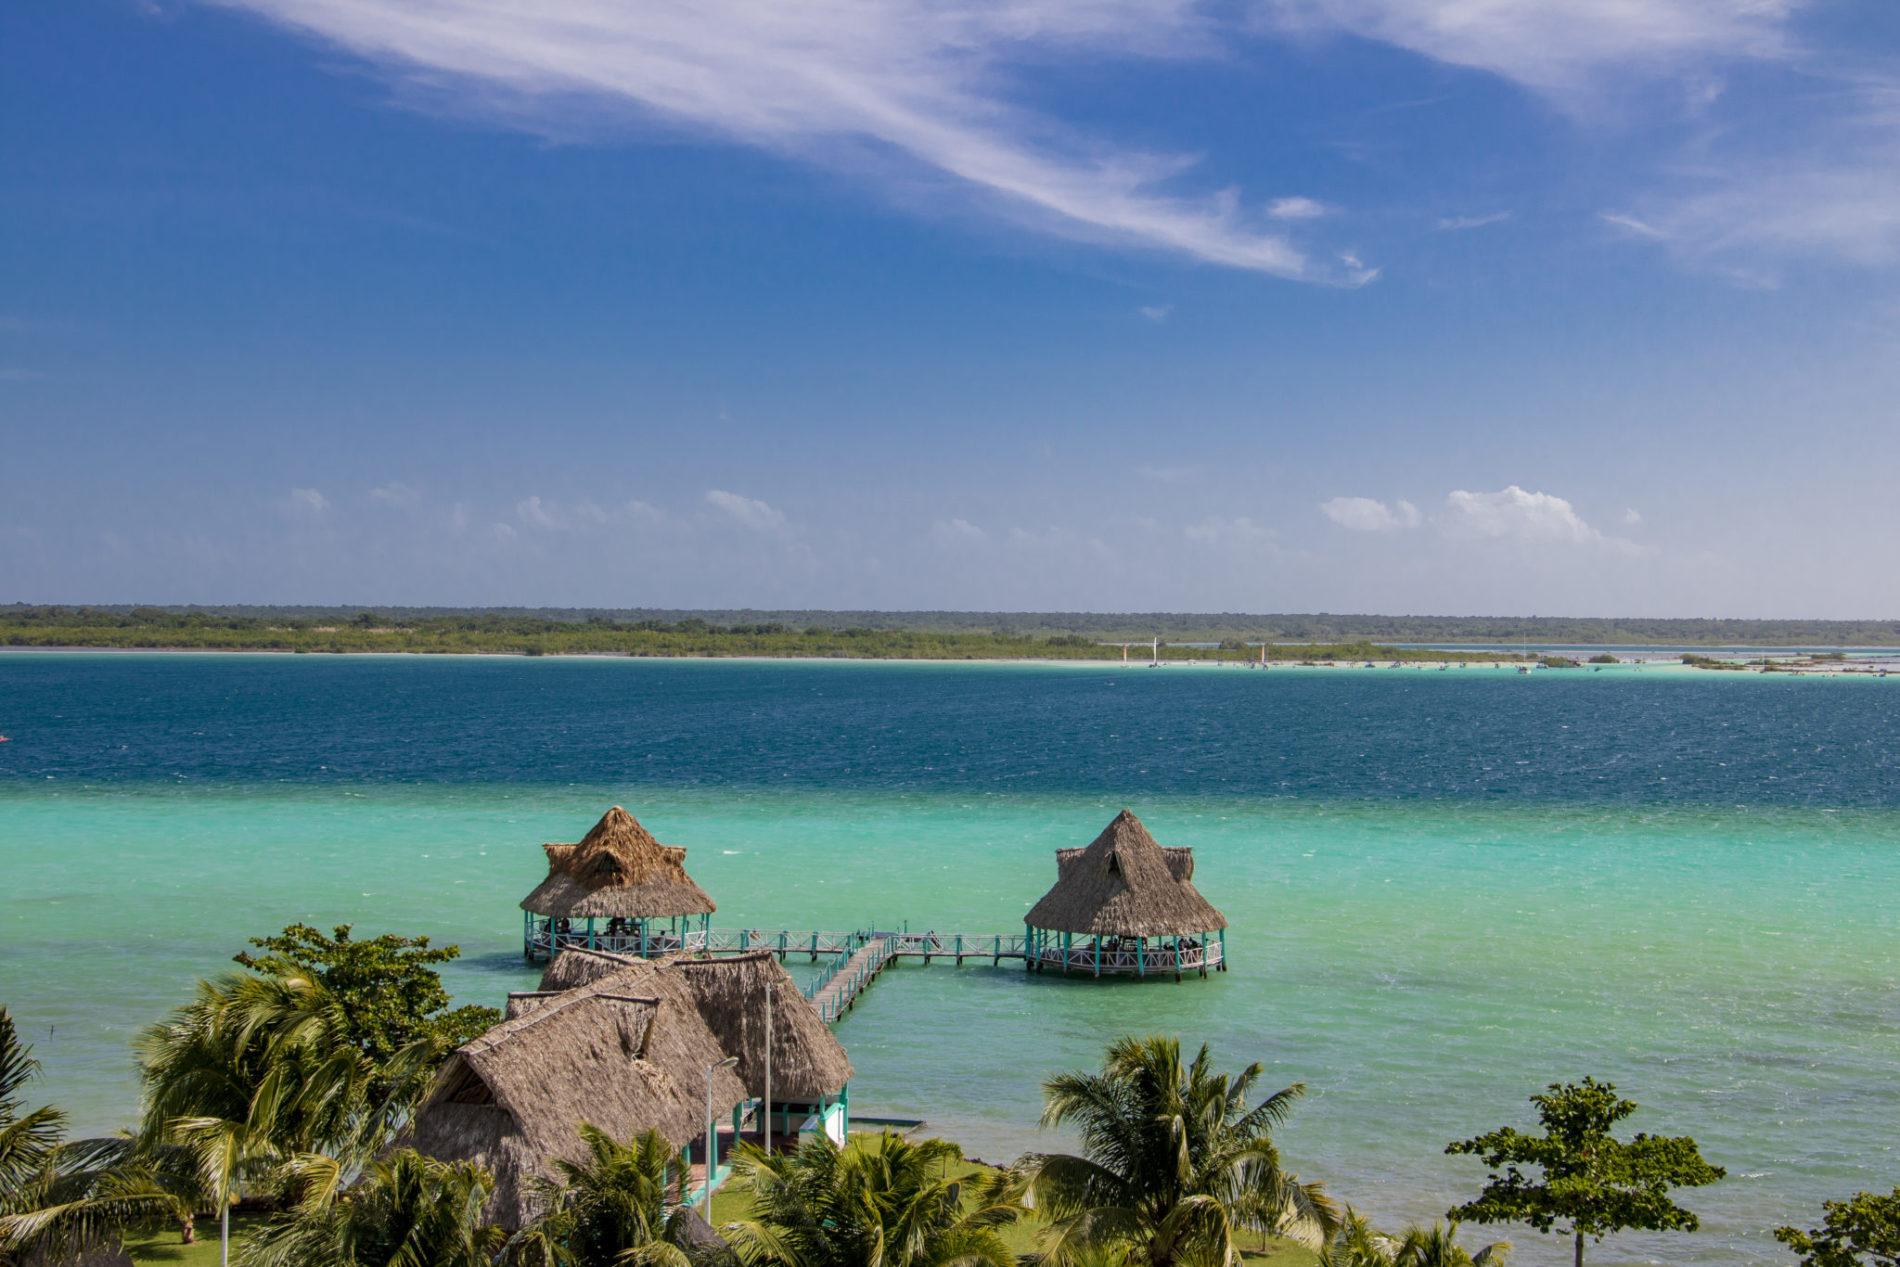 ponton-cabanes-lagune-bacalar-yucatan